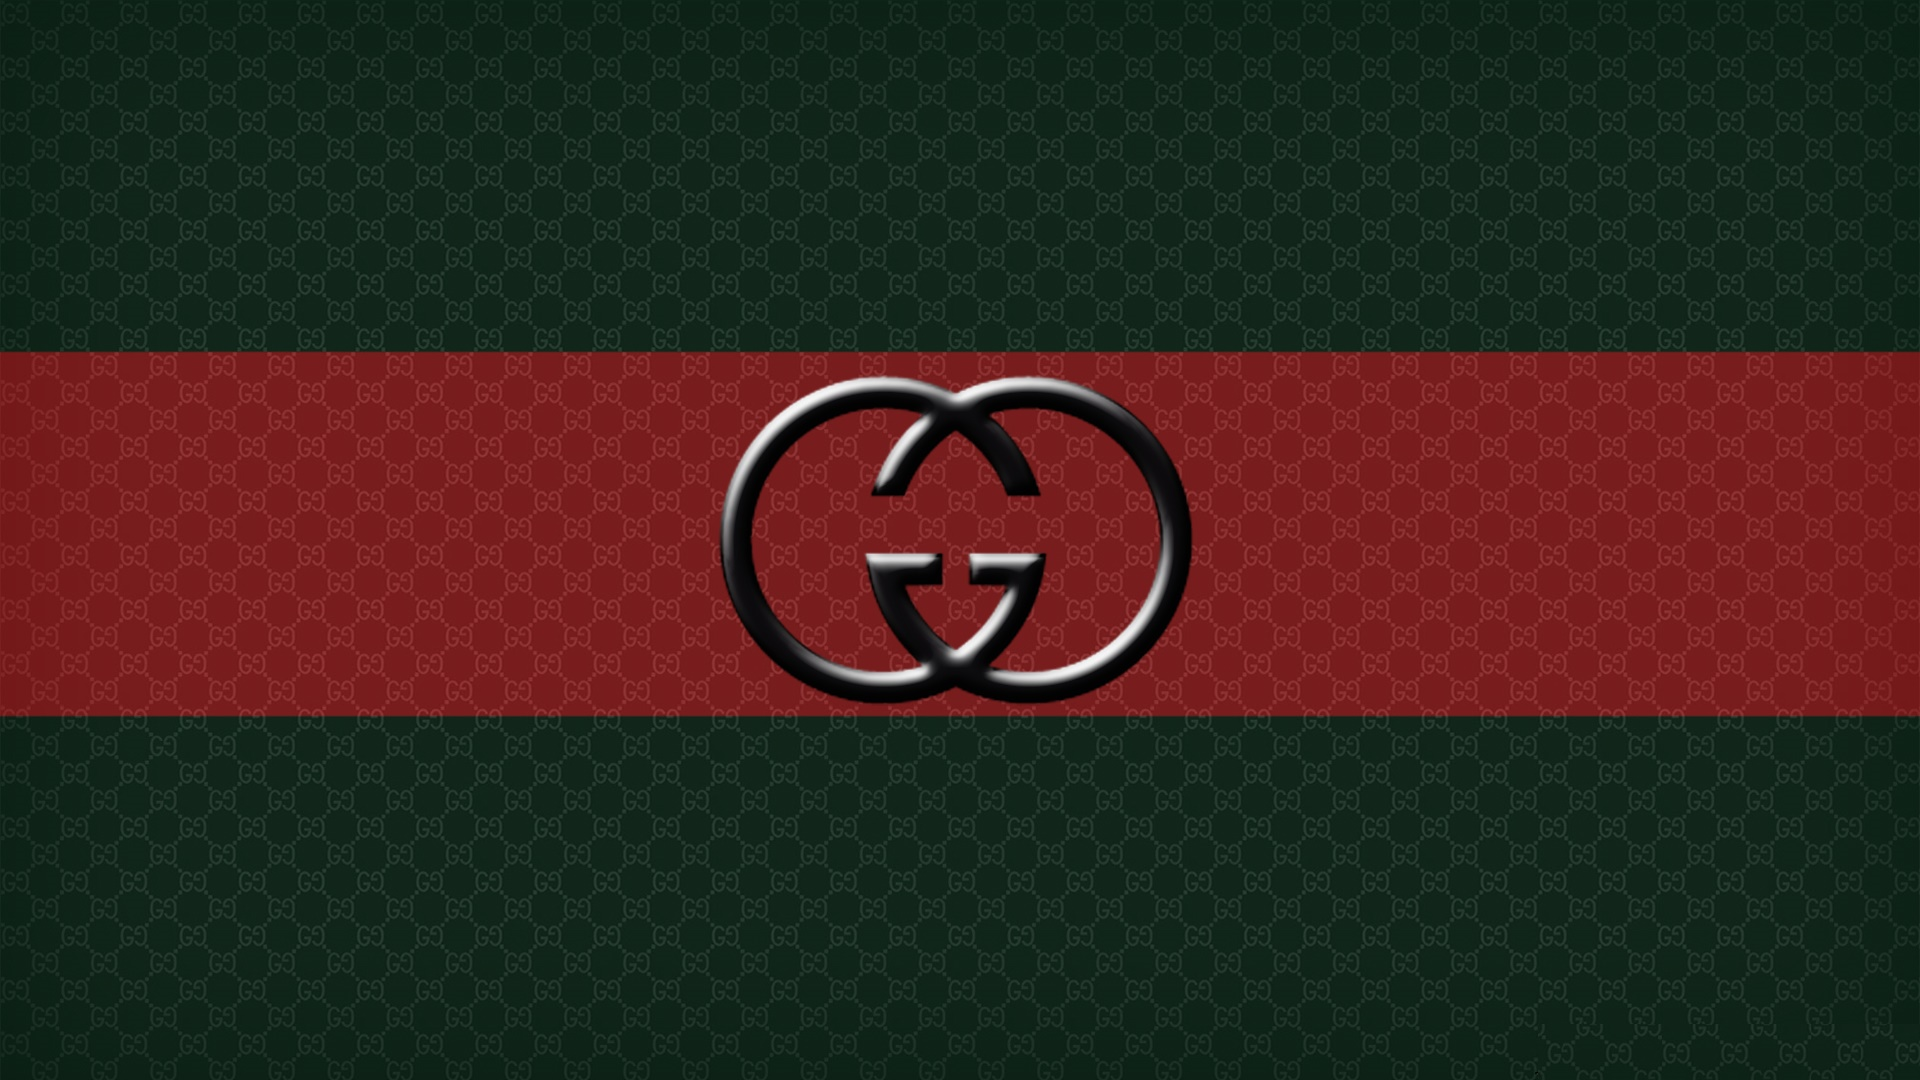 Fnatic Wallpaper Iphone Gucci Logo Wallpapers Hd Pixelstalk Net